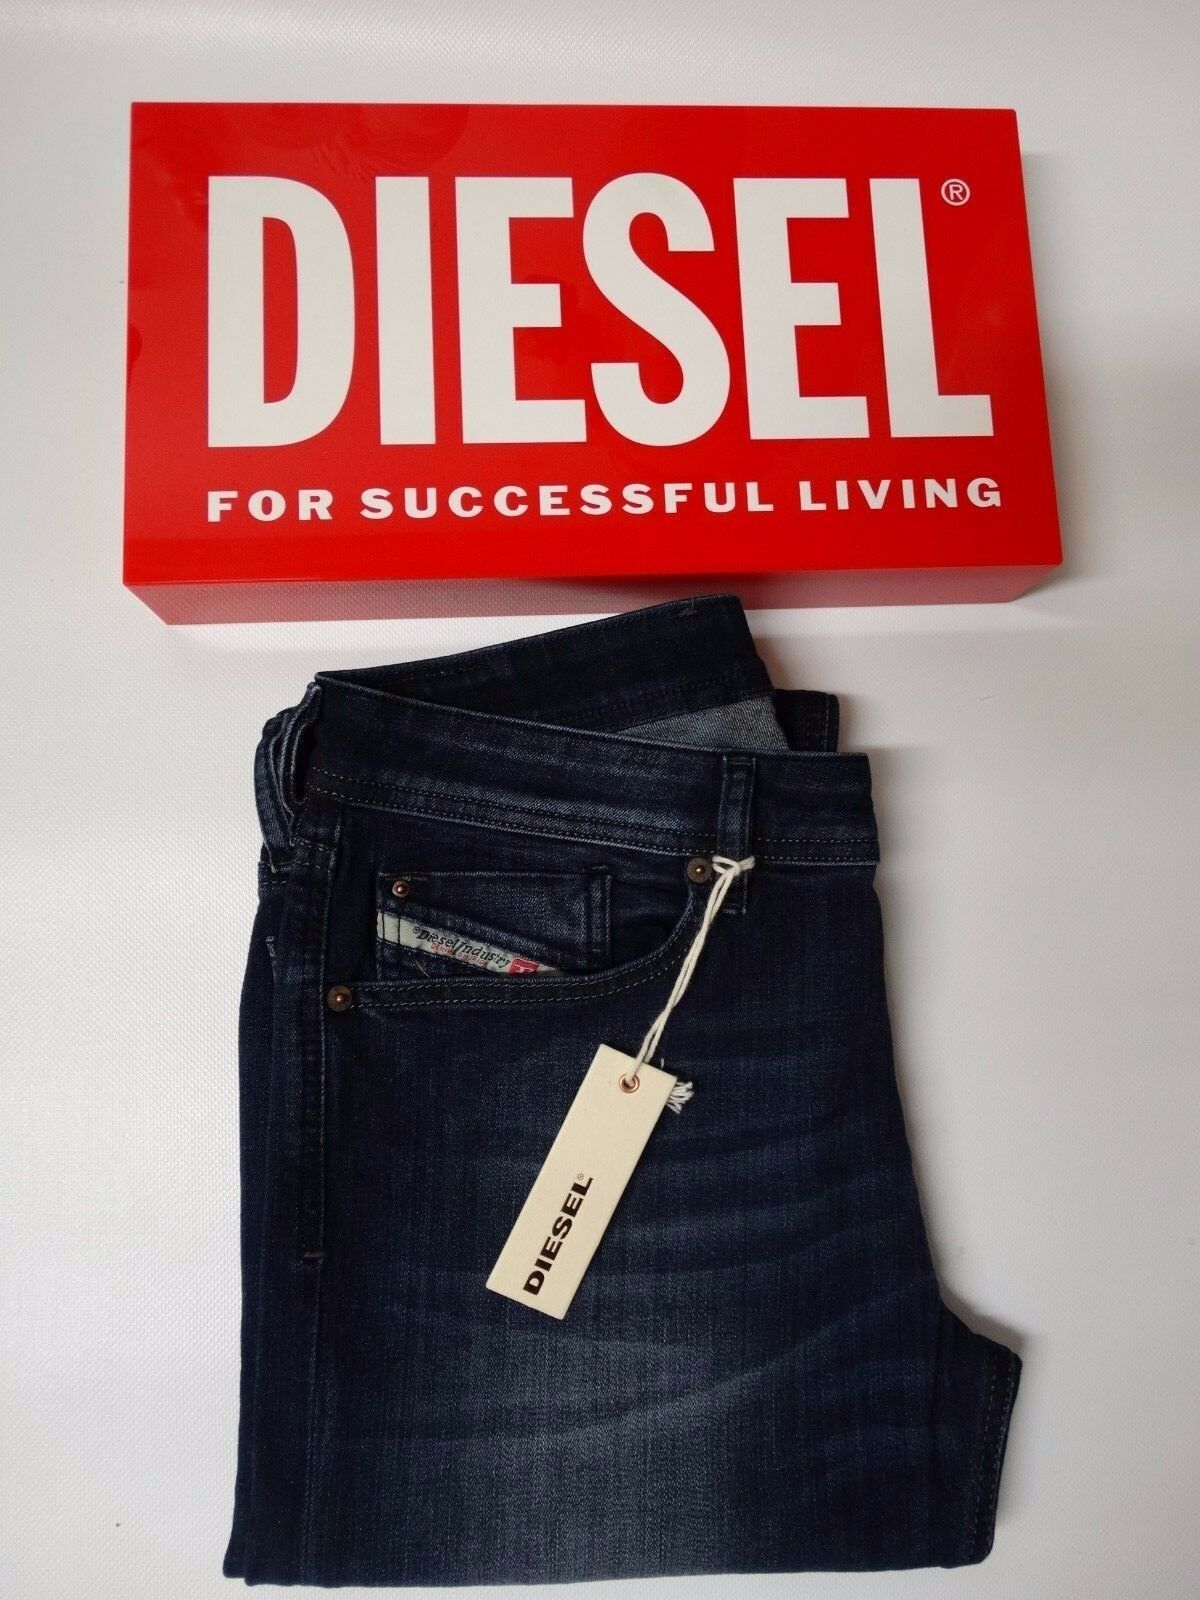 Diesel Jeans - Waykee - Straight Fit - 814W (Stretch) - BNWT